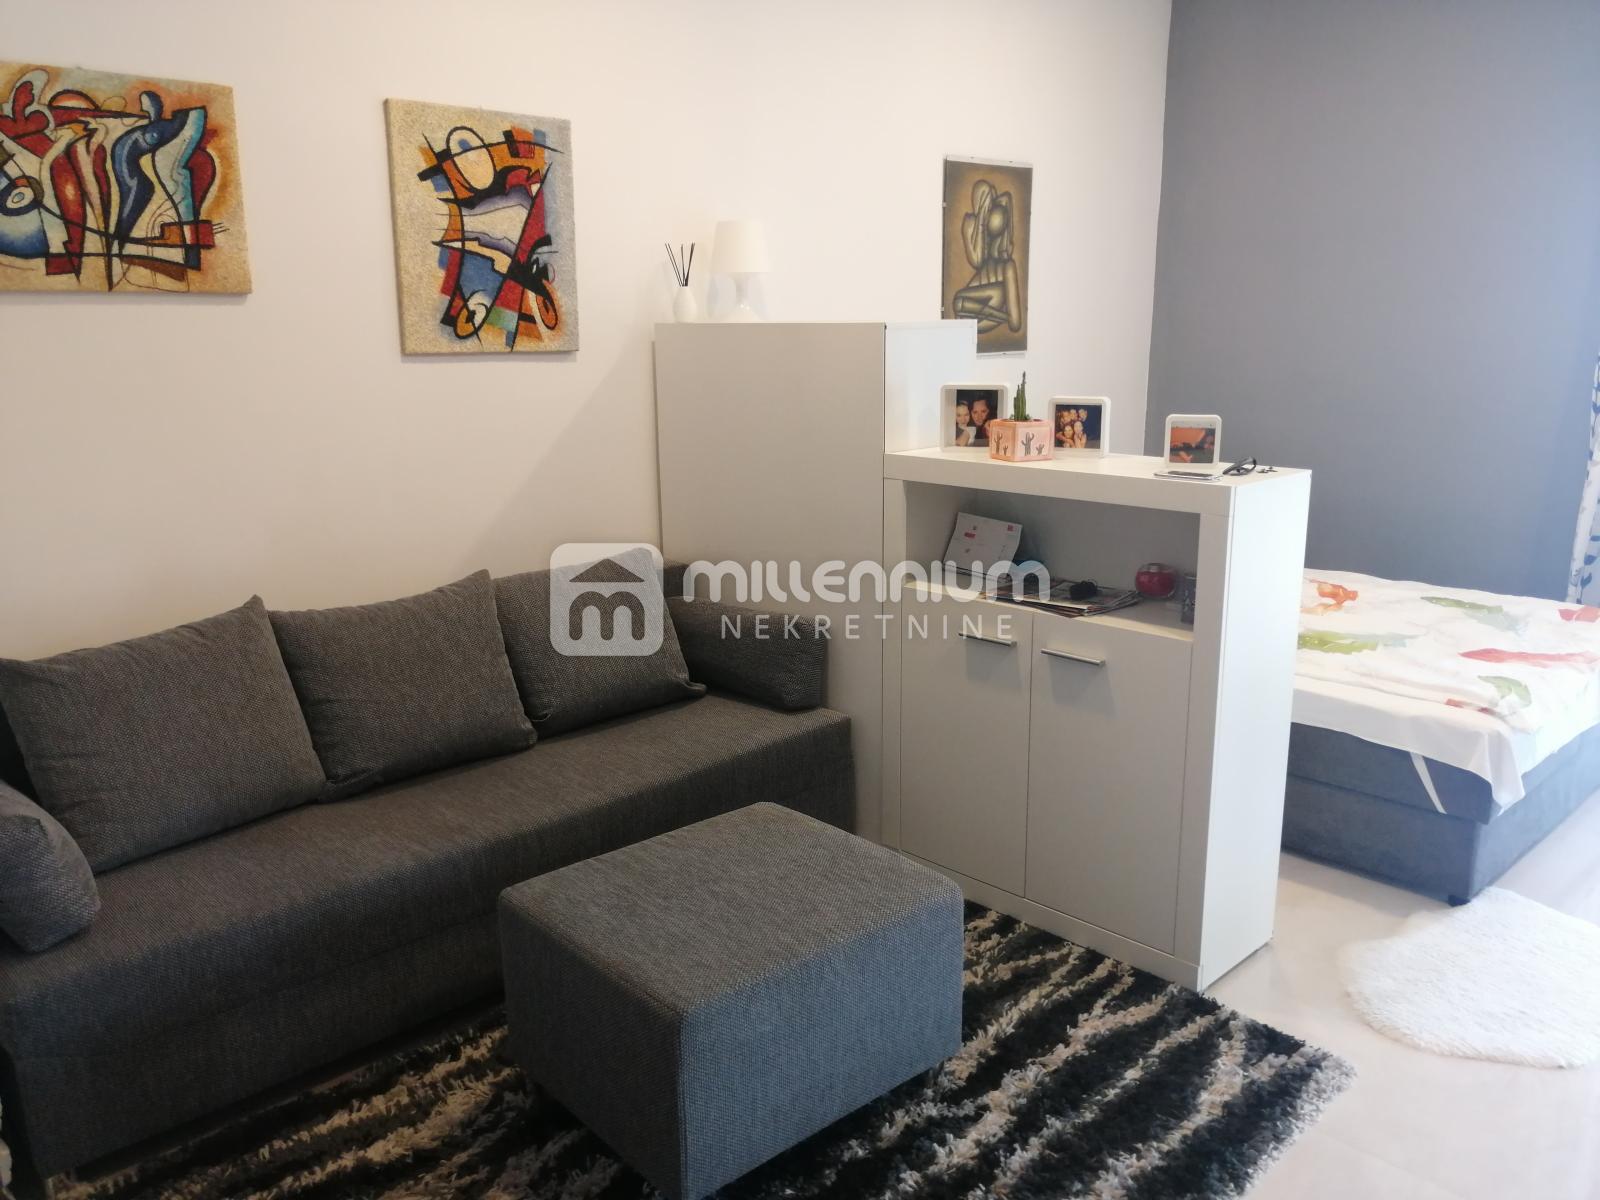 Rijeka, Turnić, moderan 1-sobni stan, terasa